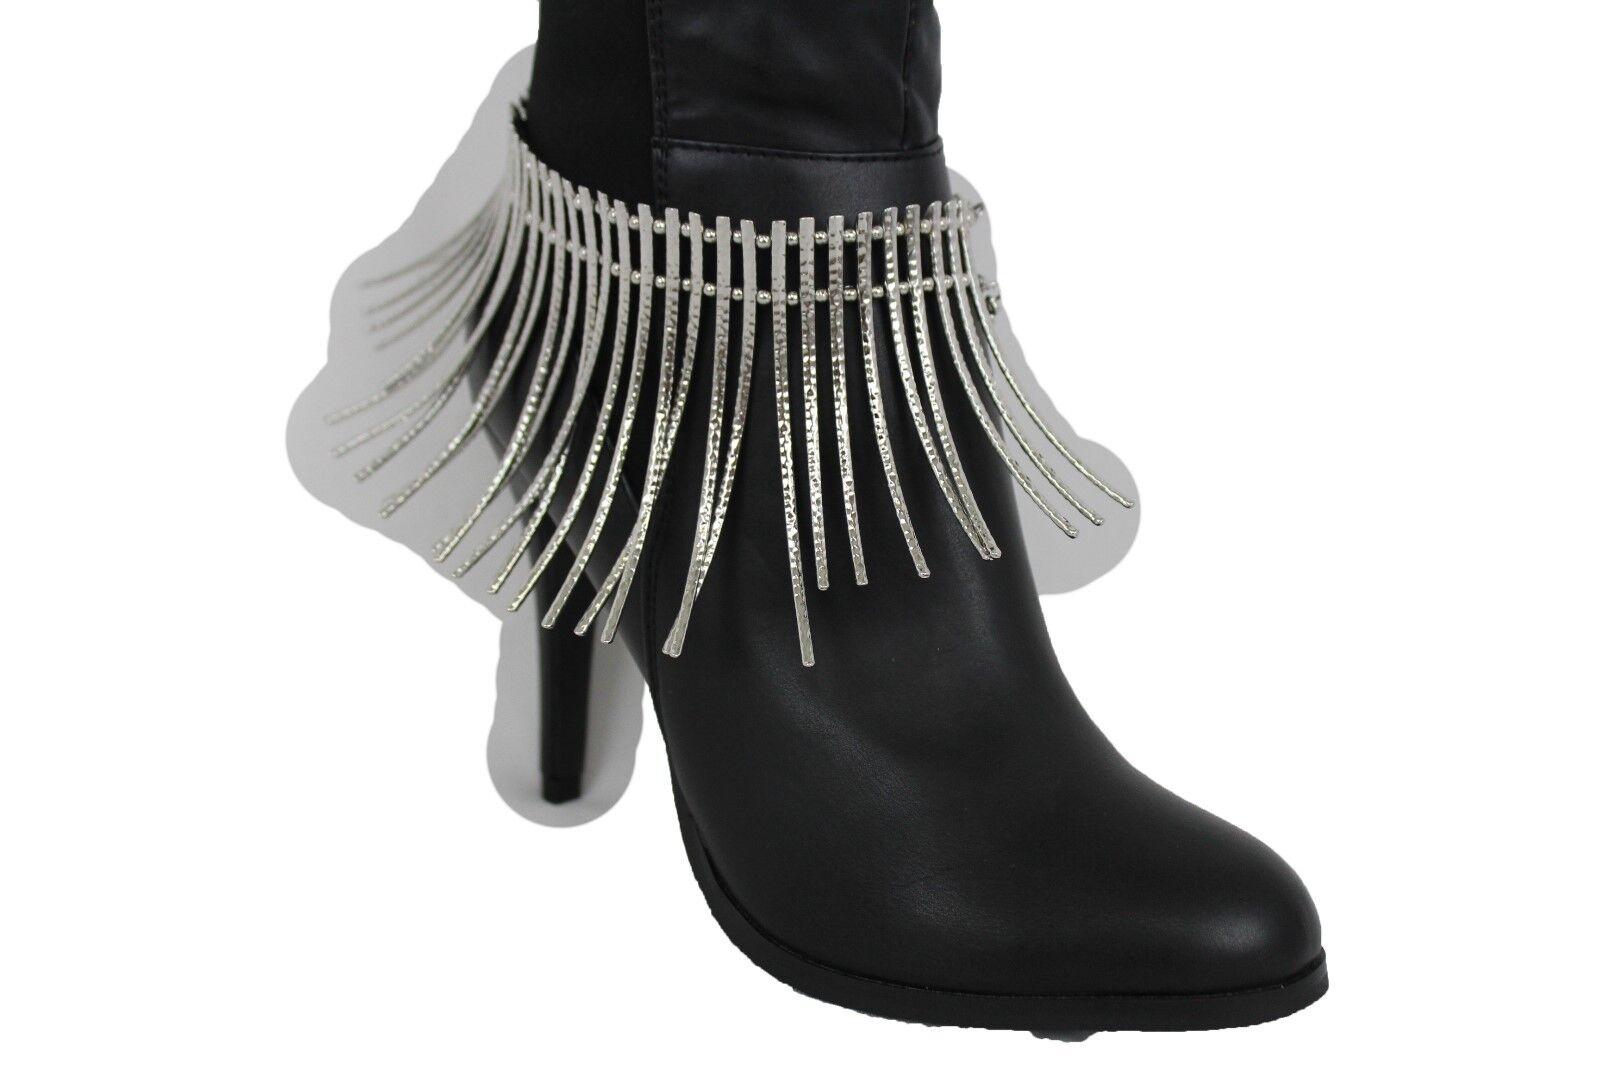 Women Boot Bracelet Silver Metal Chain Long Stud Anklet Shoe Bling Dressy Charm